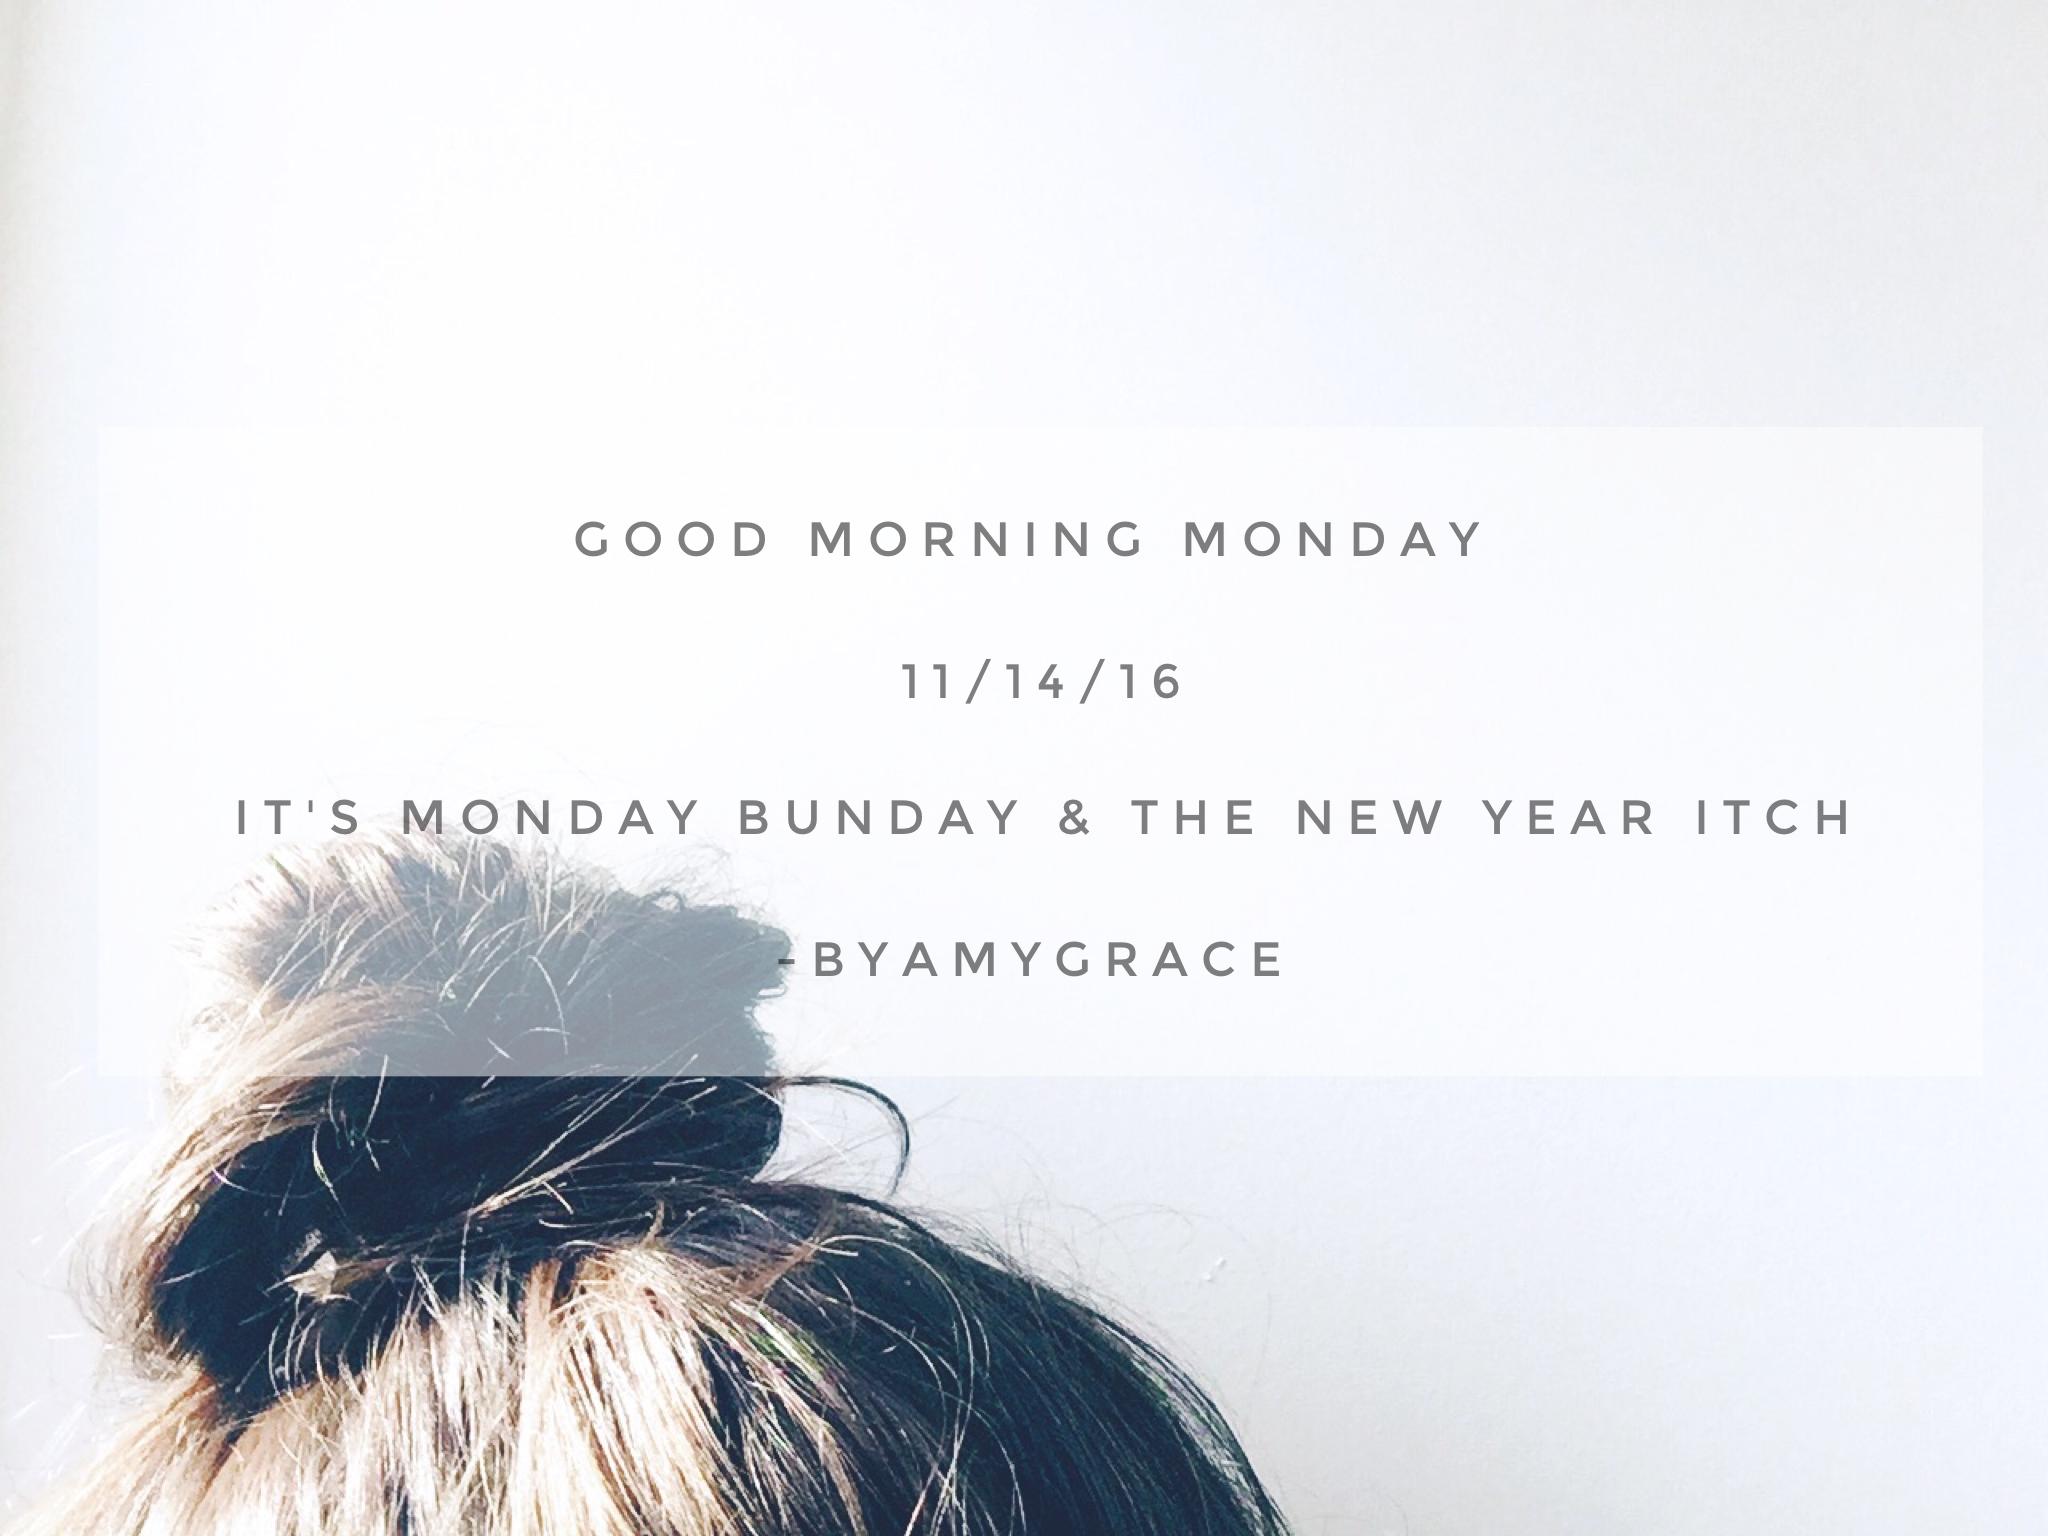 goodmorningmonday.11/14/16.byamygrace